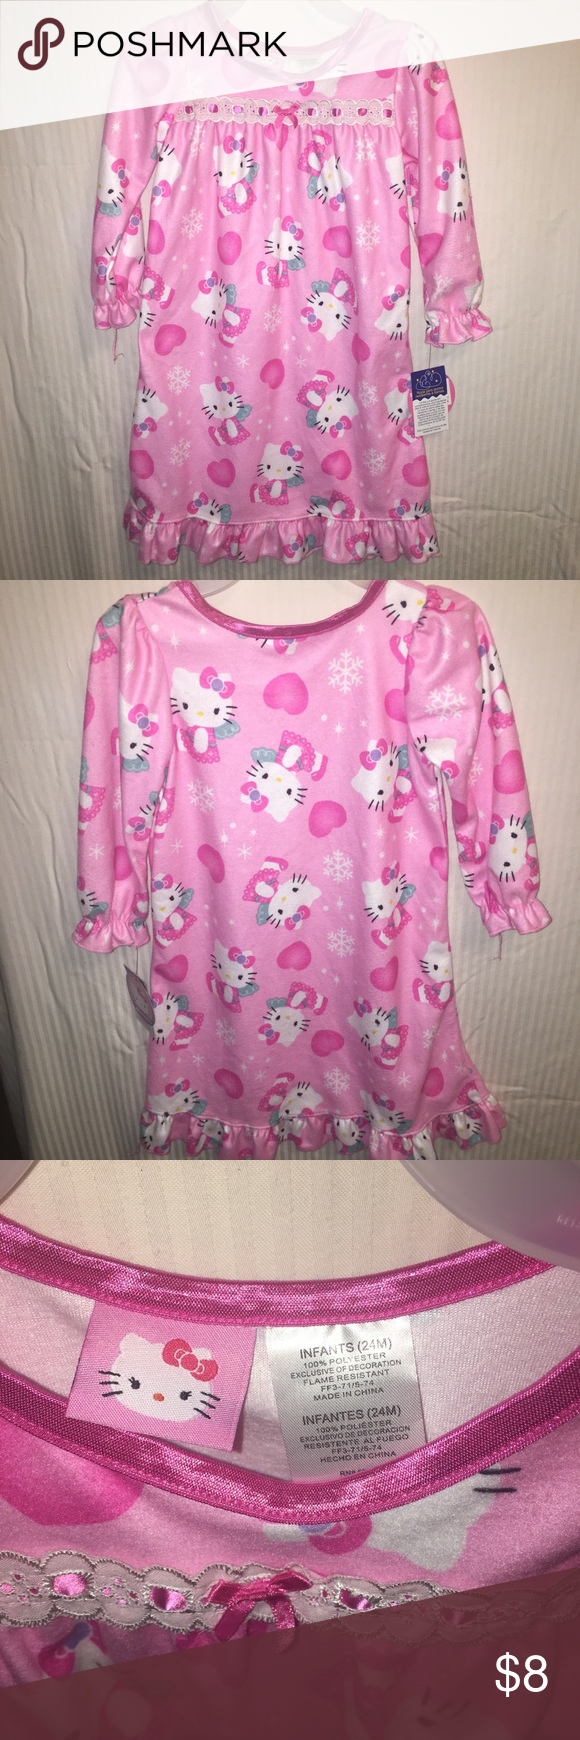 b67d8e44c Snowflakes and hello kitty. Pink bow. Pajama gown. Ruffle Sleeve Ruffle hem.  Hello Kitty Pajamas Nightgowns